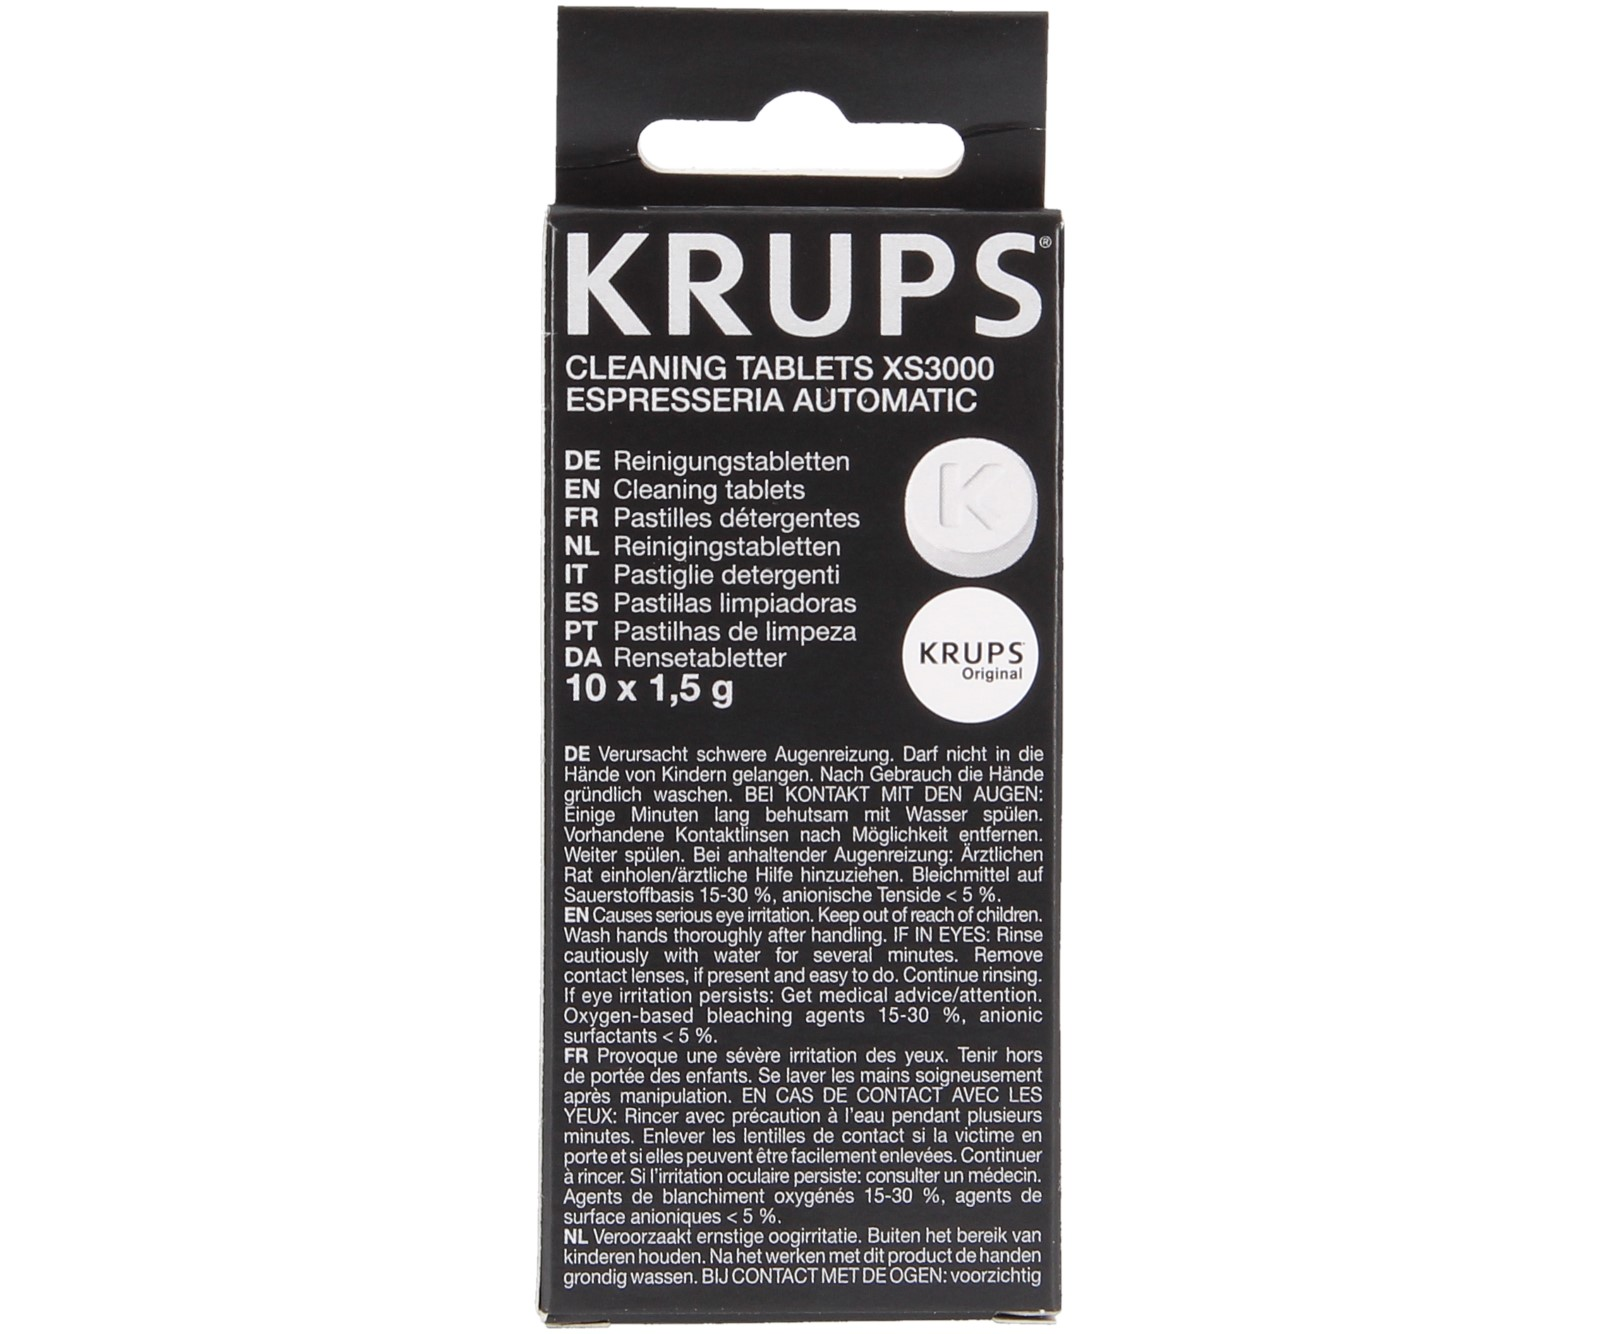 10x ТАБЛЕТКИ для очистки кофемашины KRUPS XS3000